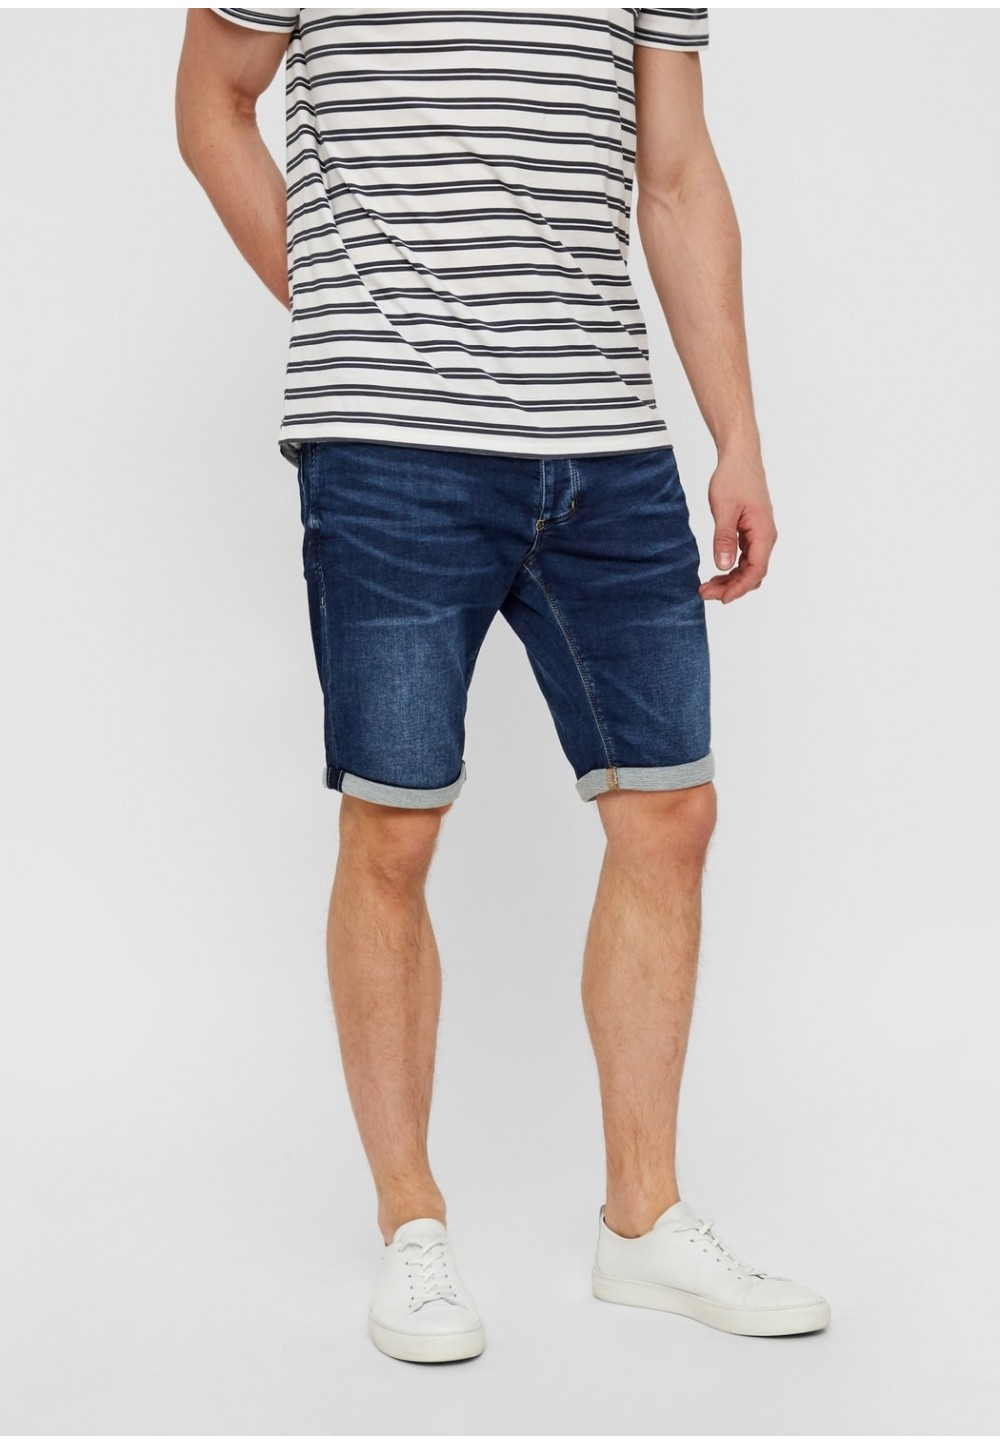 Мужские шорты из денима  Jason